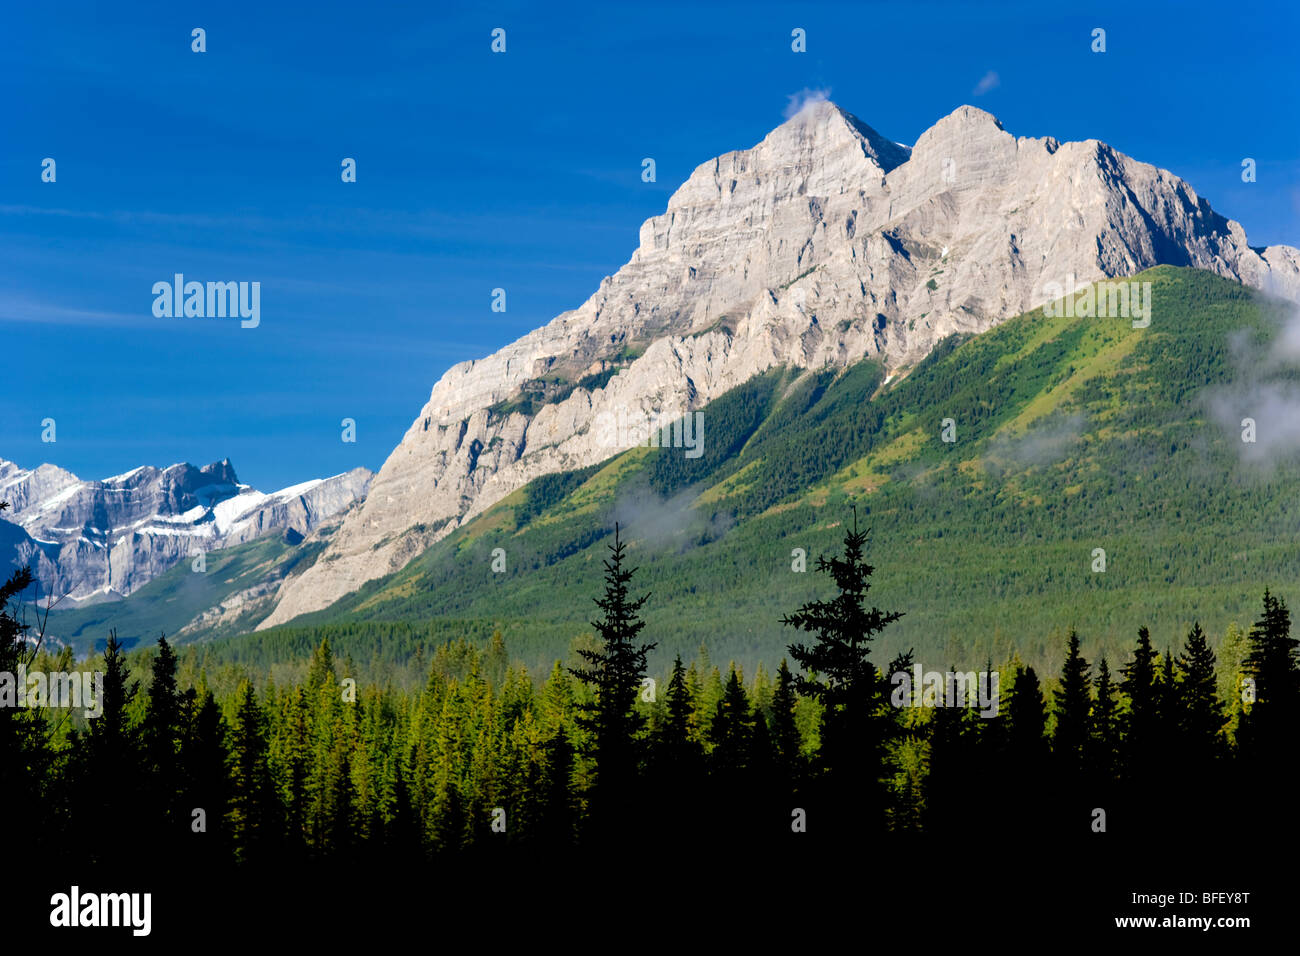 Kananaskis Provincial Park, Alberta, Kanada, Bäume, Wald, Berg, Rockies, geologische Formation Stockbild